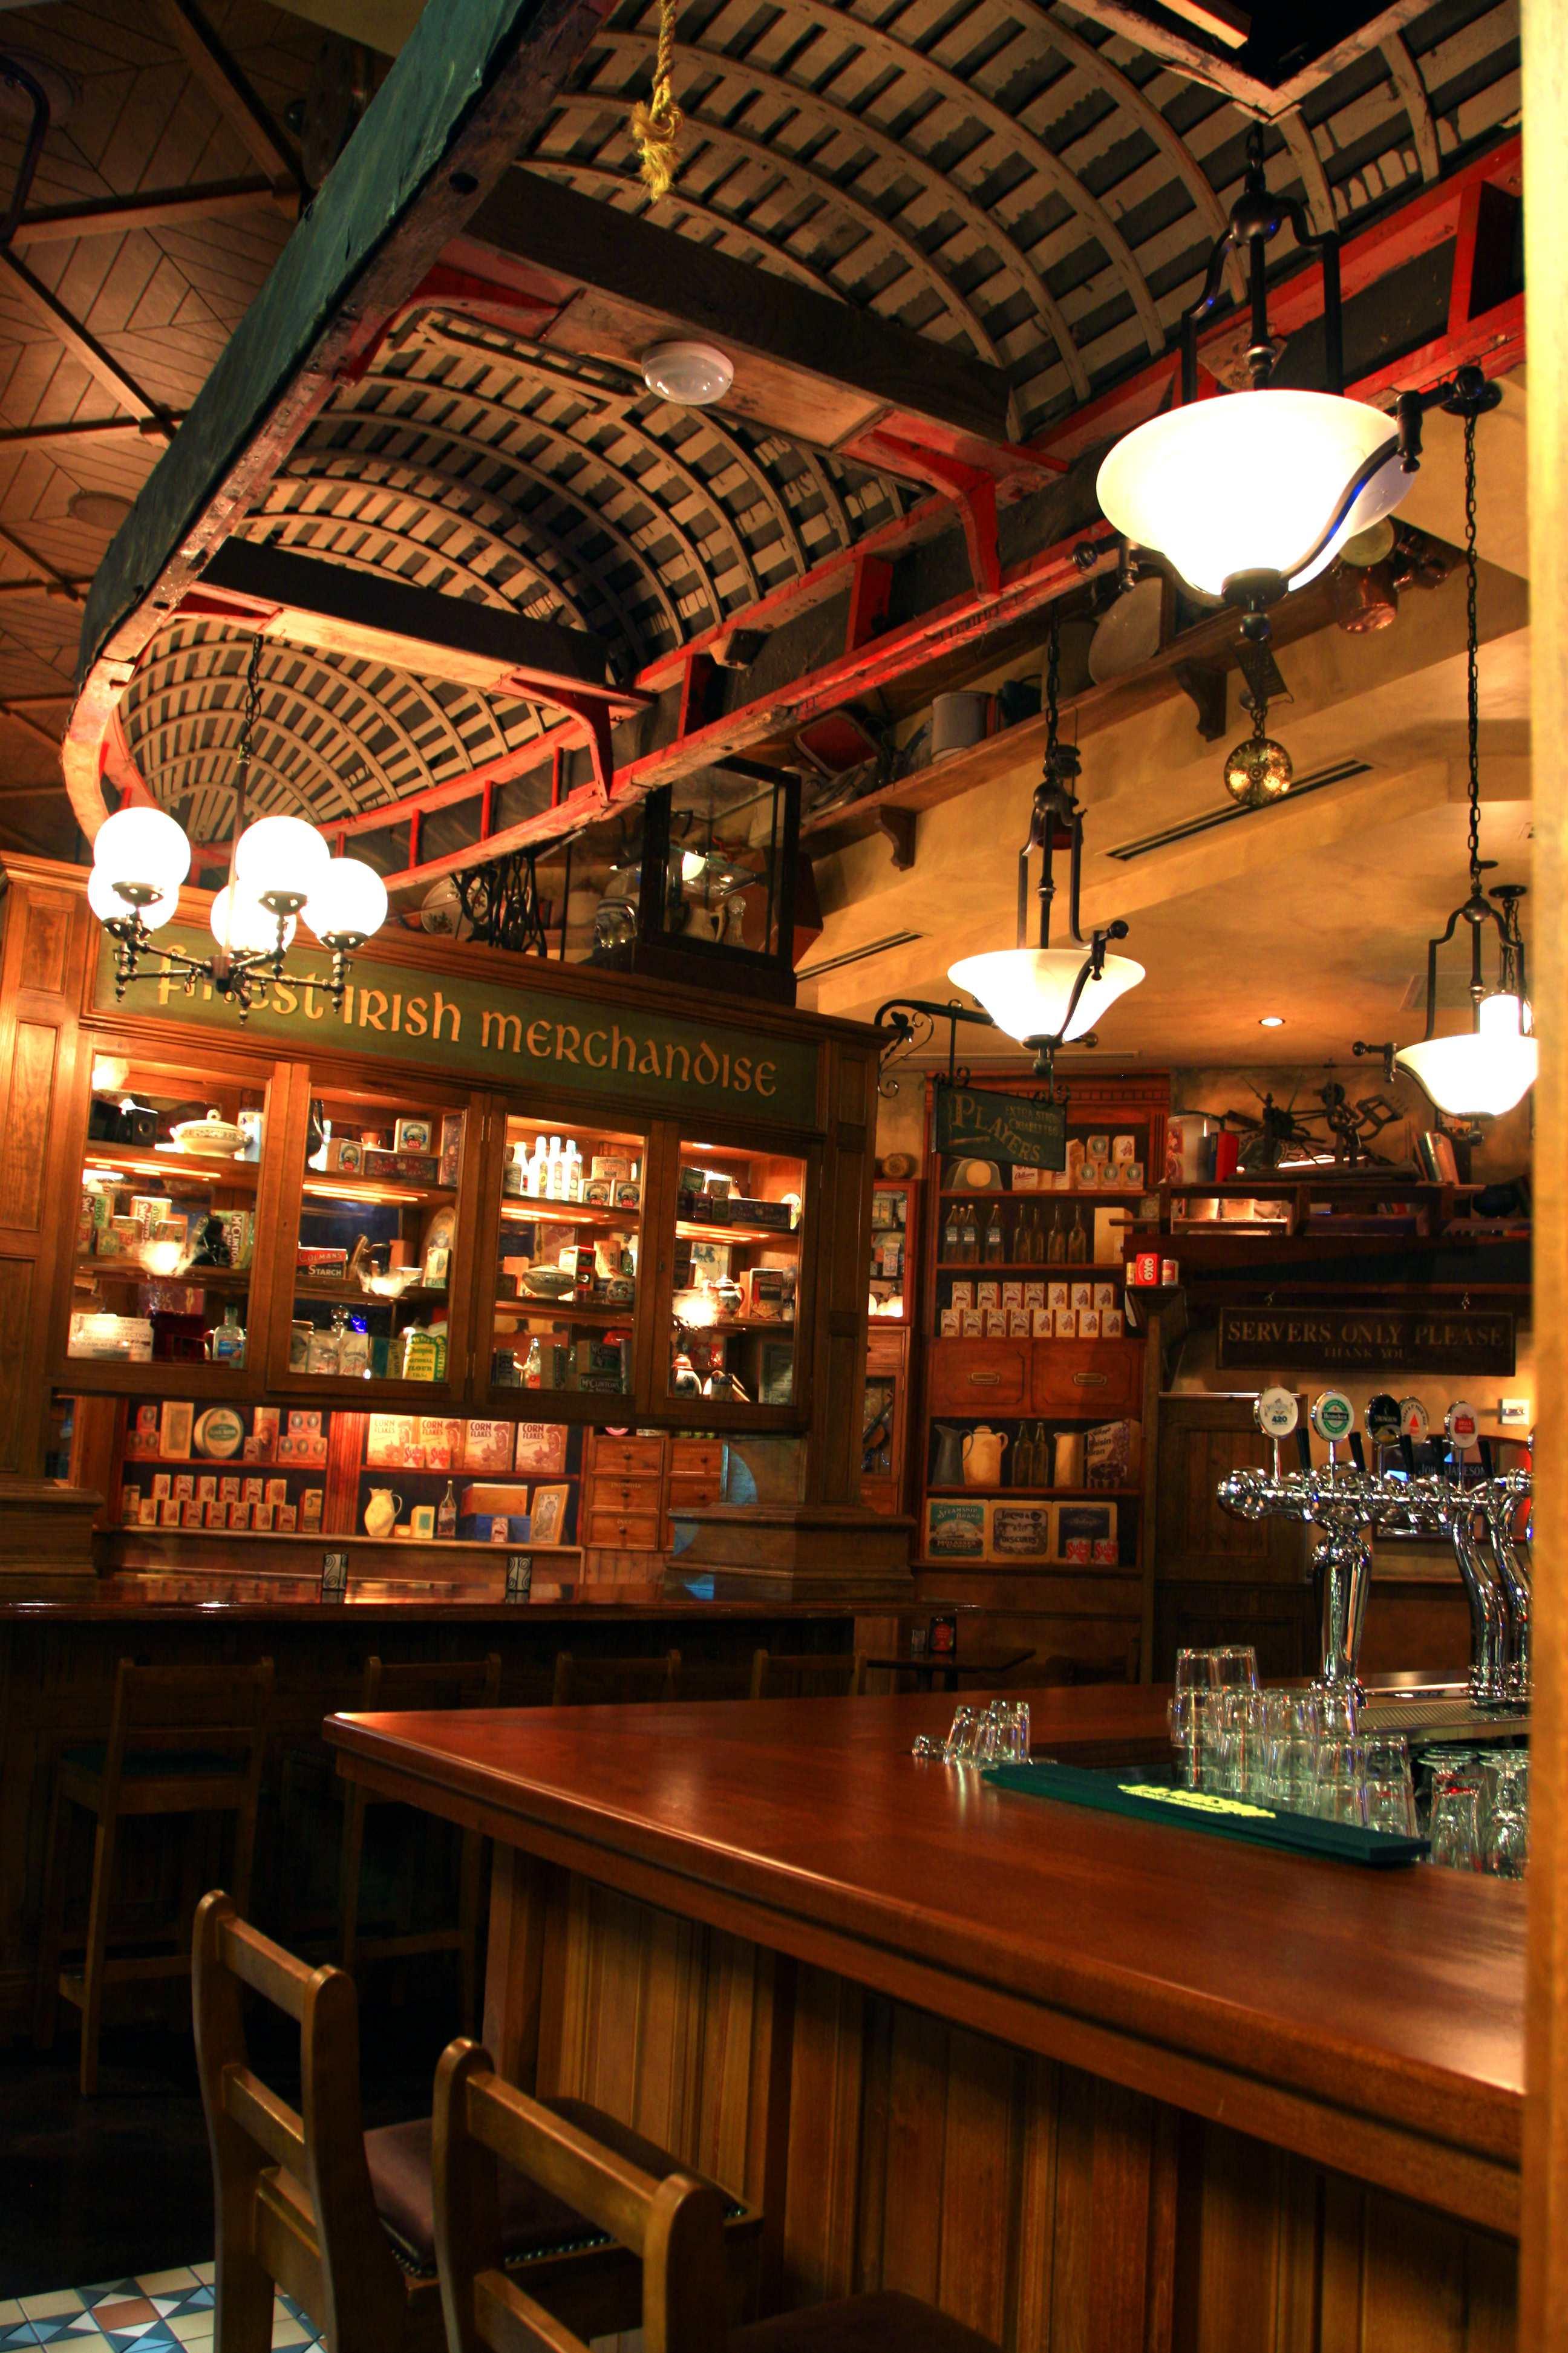 The Event Management Team at Buckheads Fado Irish Pub